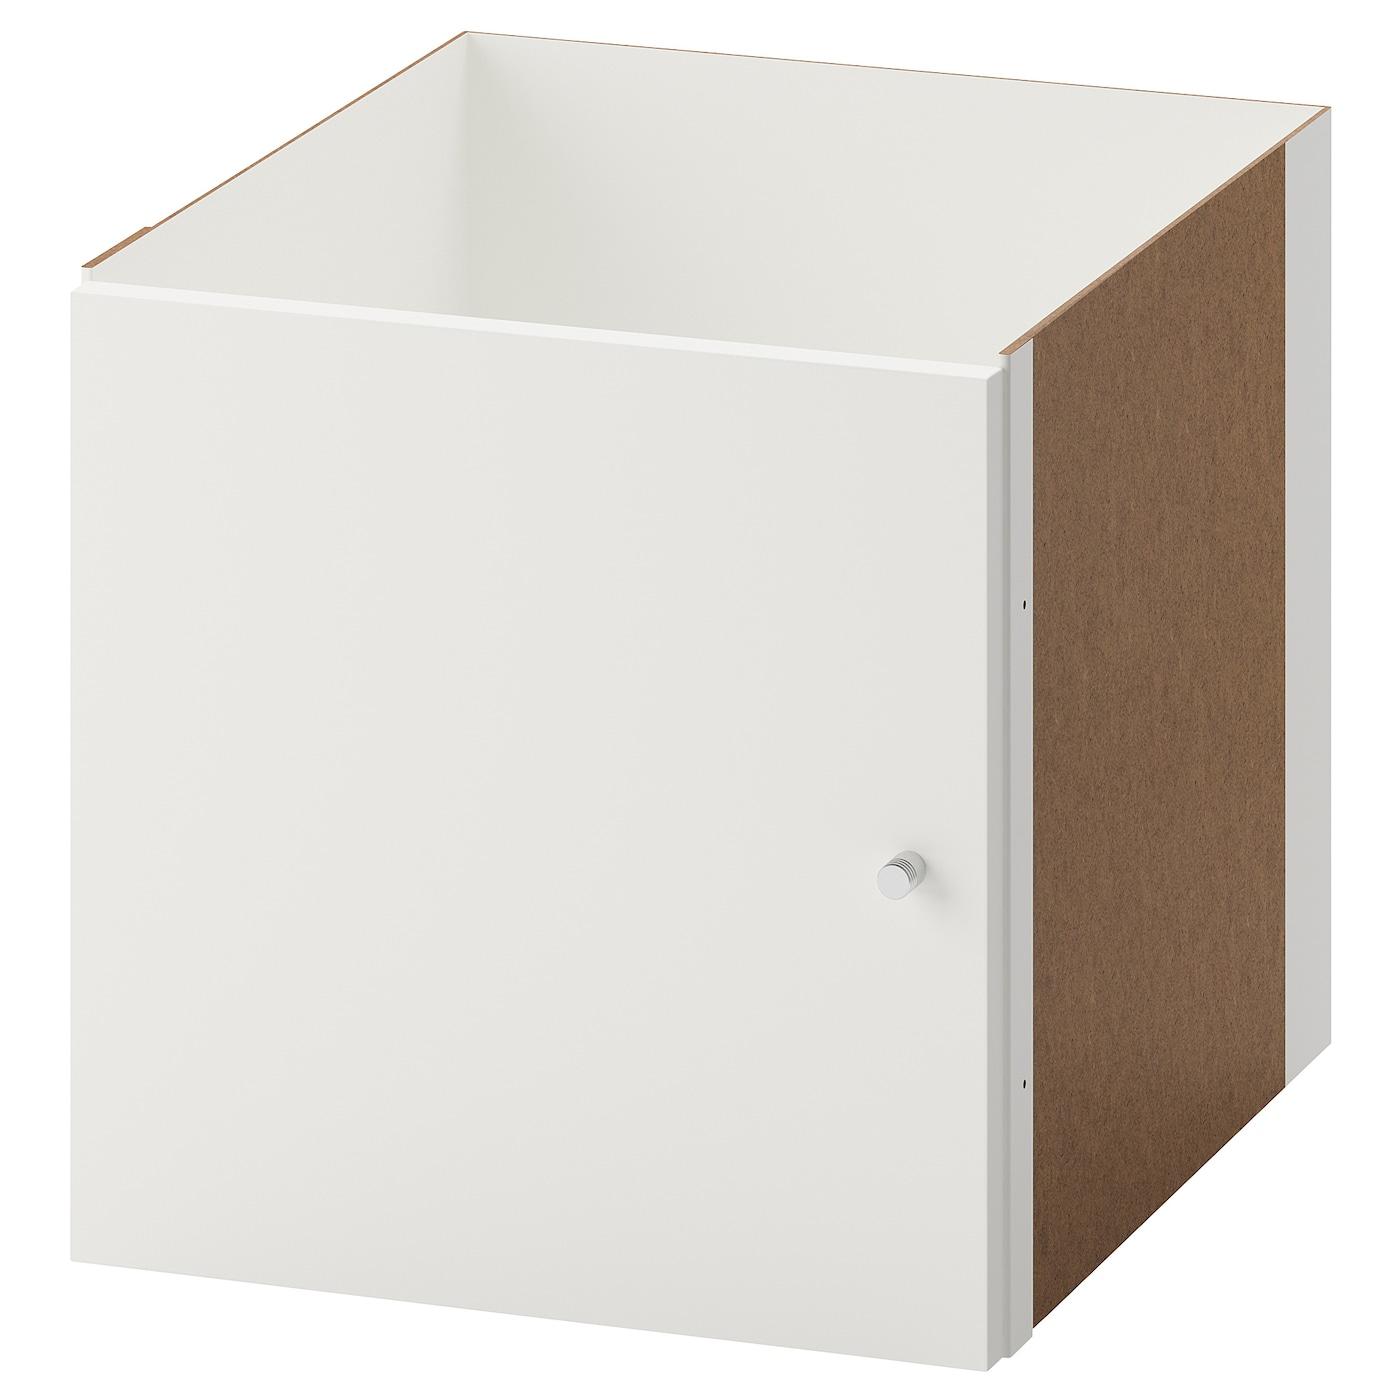 Kallax Insert With Door White Ikea Switzerland